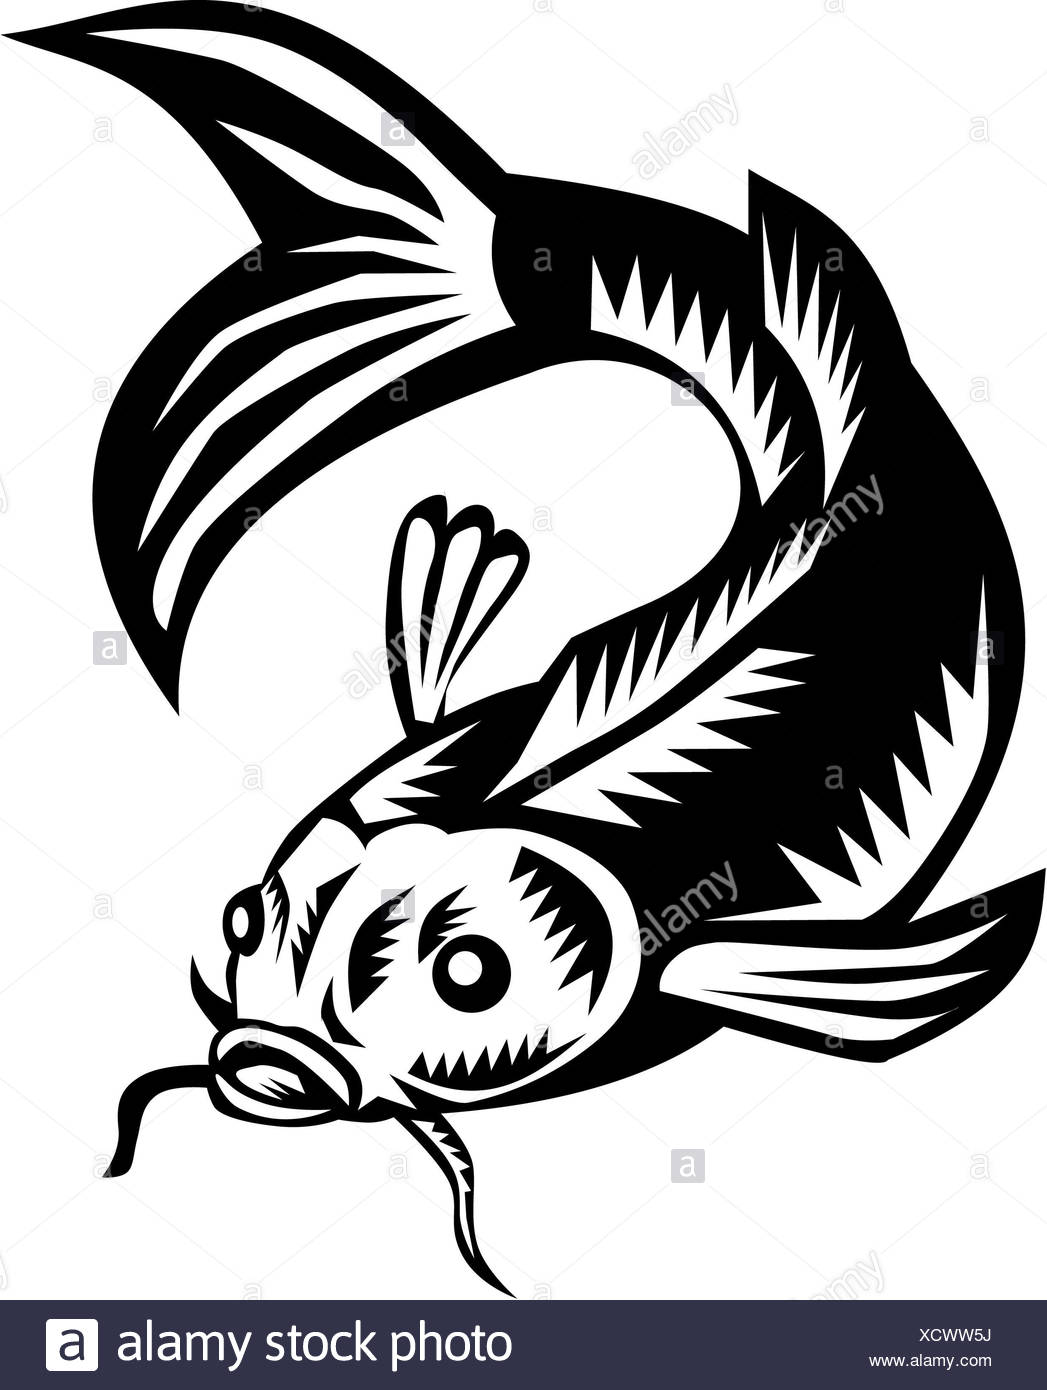 carp black and white stock photos images alamy 18th Century Paintings Men Hand Some koi nishikigoi carp fish woodcut stock image